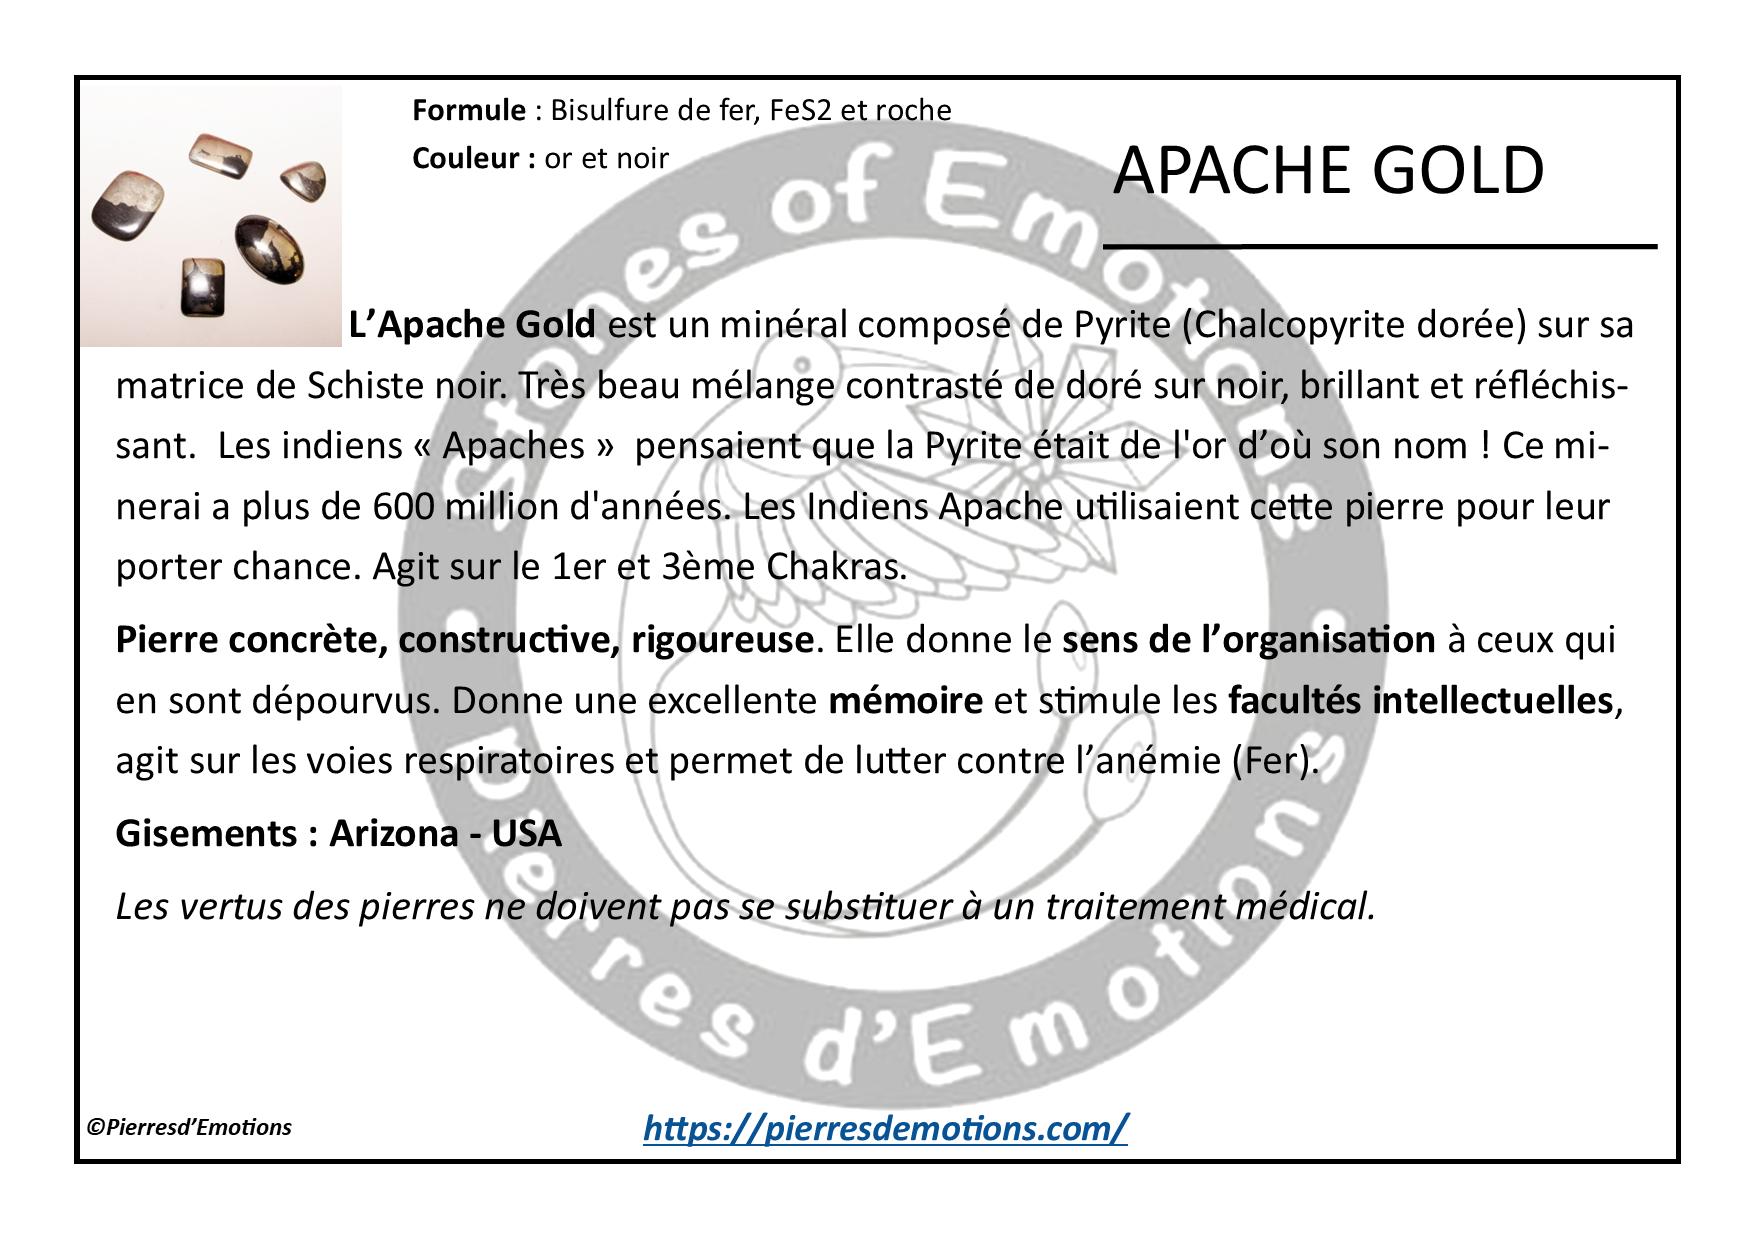 ApacheGold